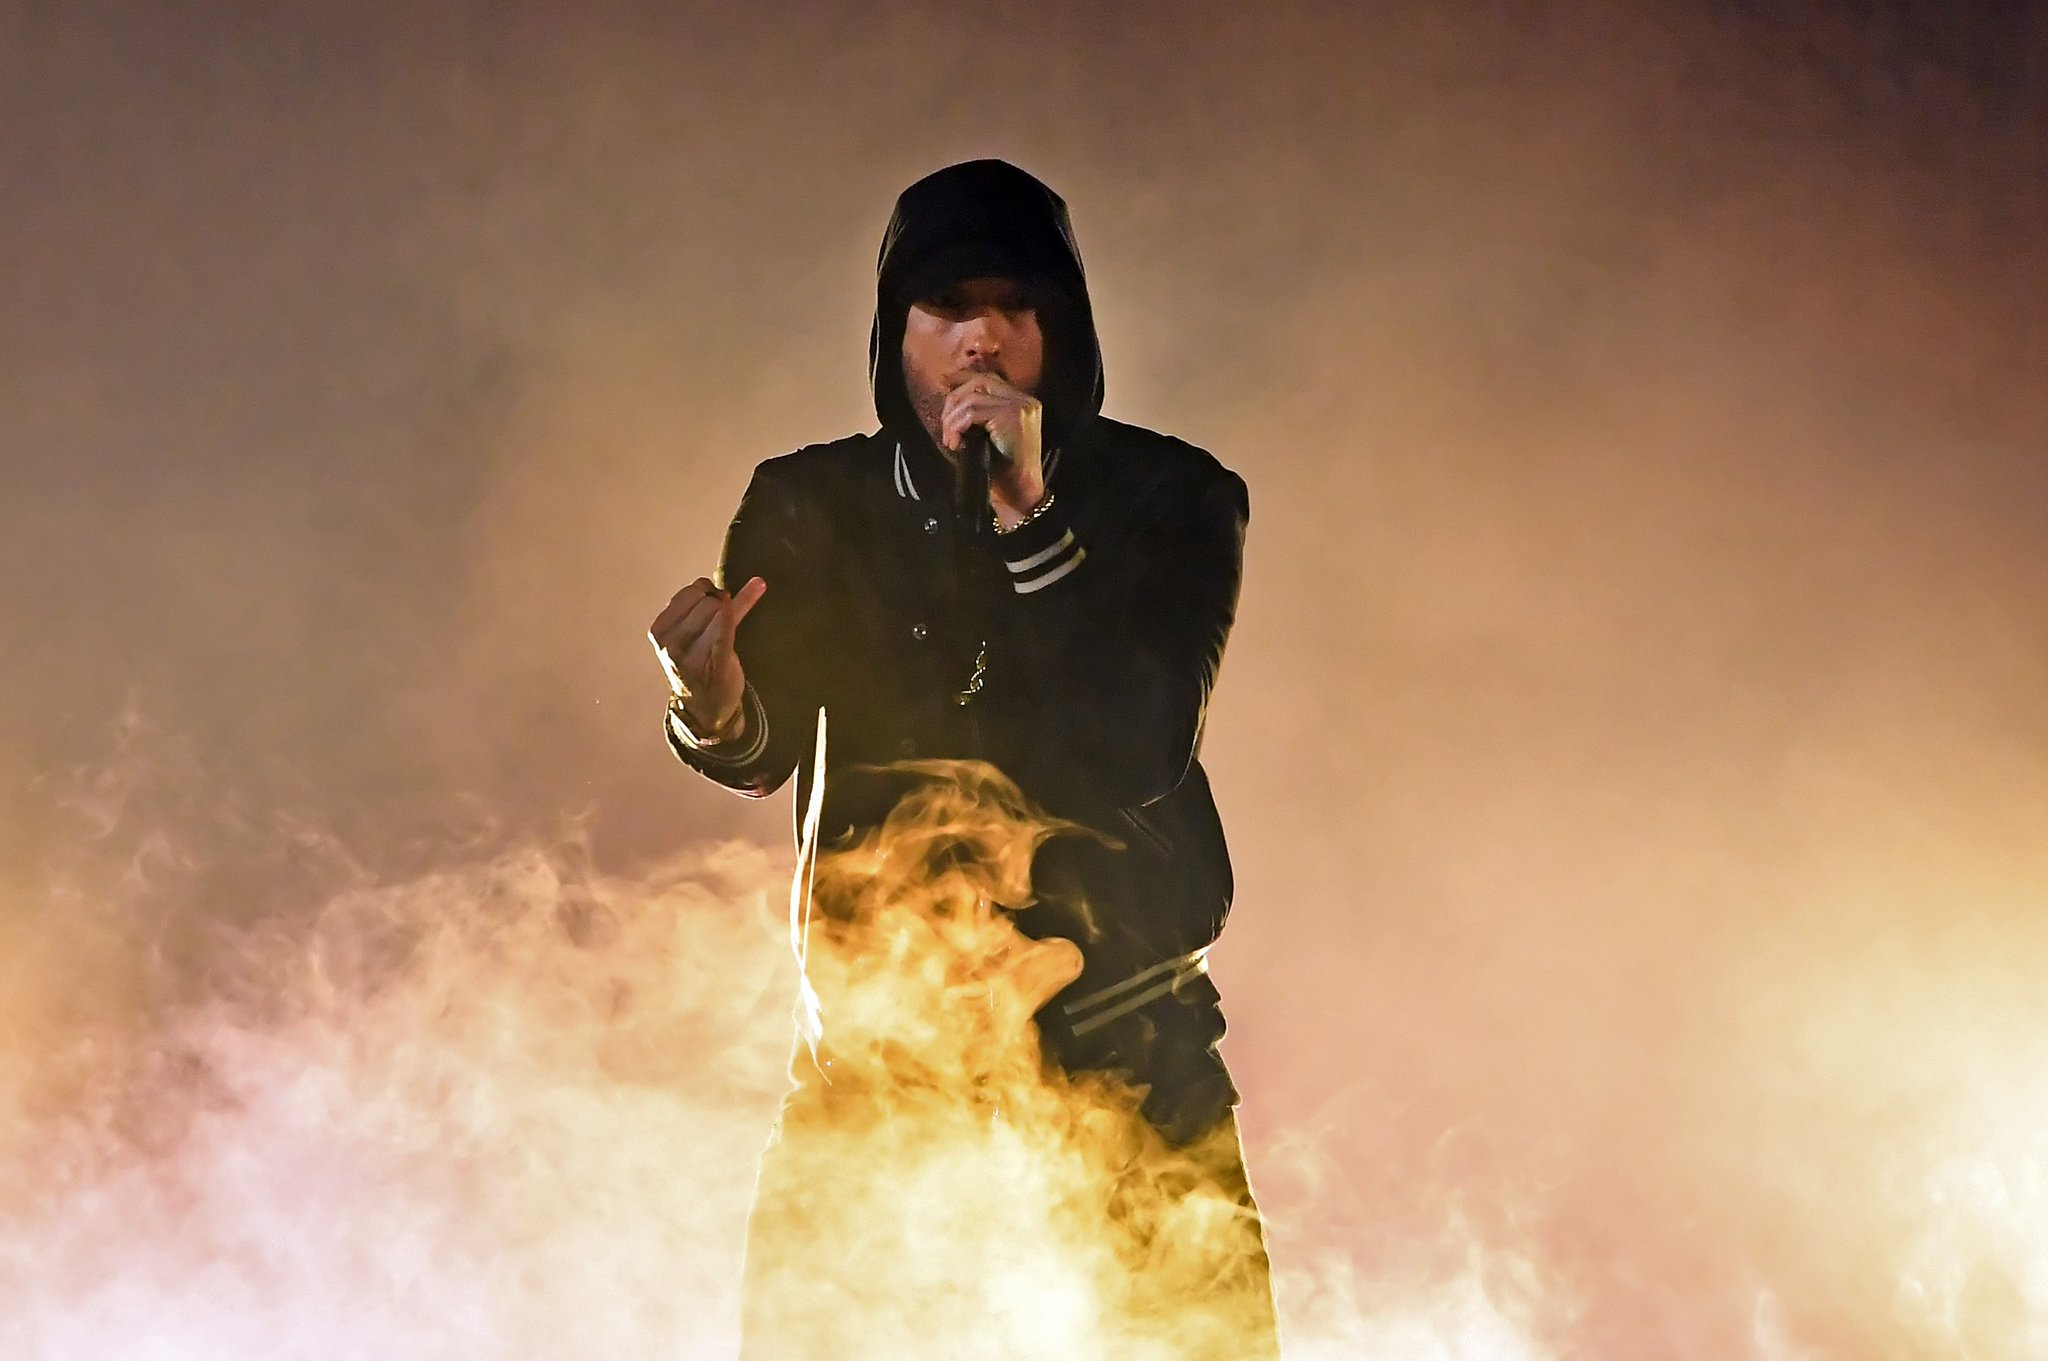 .@Eminem used his latest awards show performance to slam the NRA. https://t.co/k8svPB0iWN https://t.co/v4d8zpYC0o